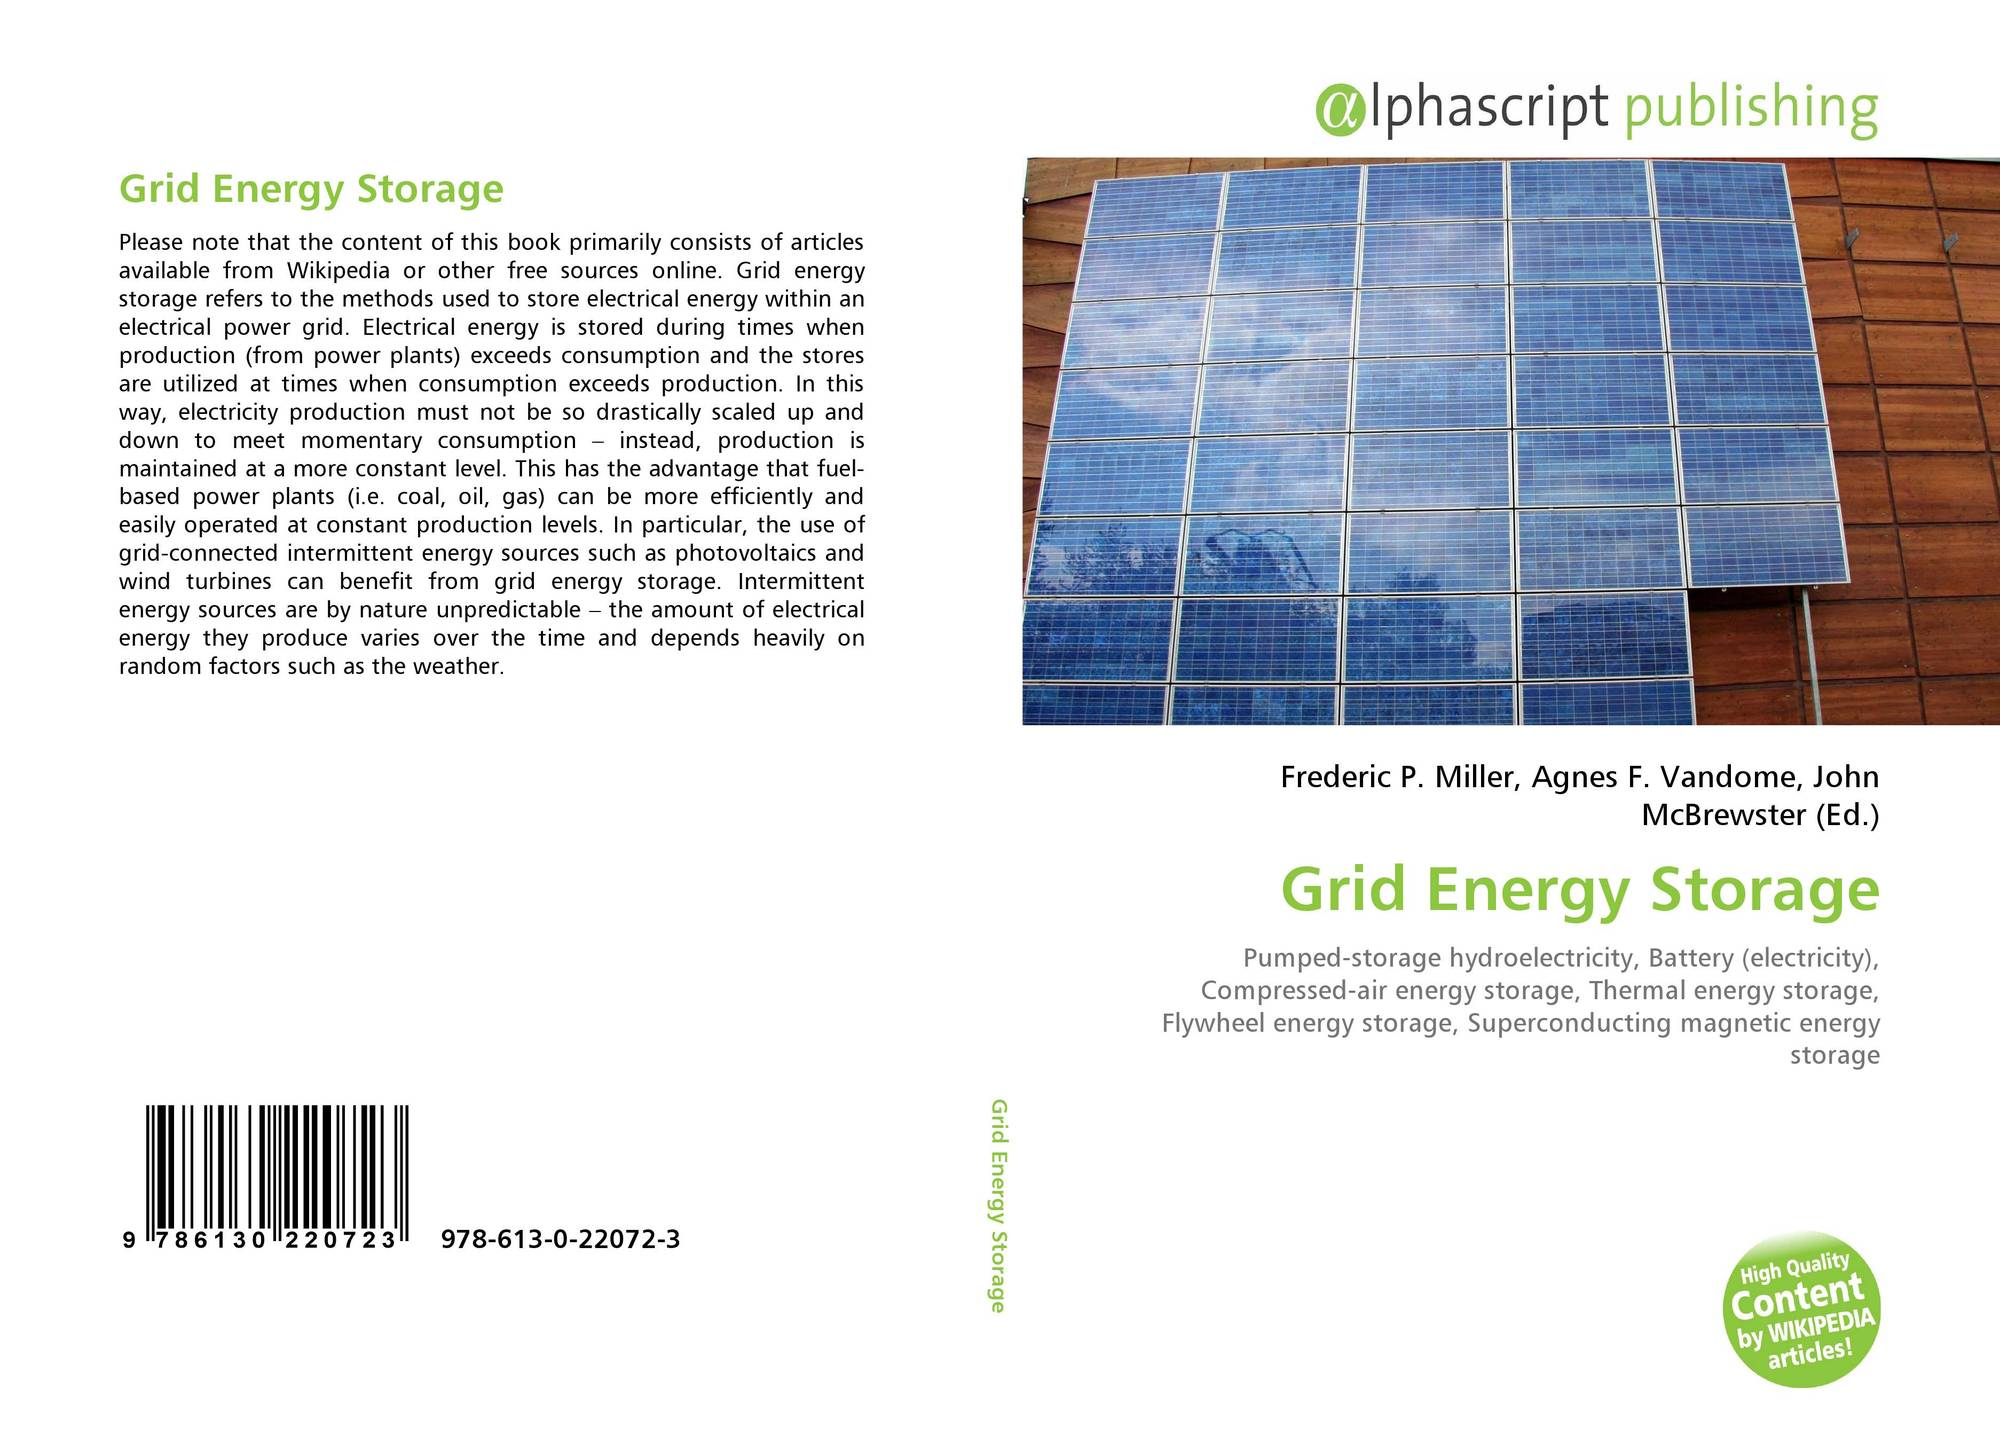 Grid Energy Storage, 978-613-0-22072-3, 6130220723